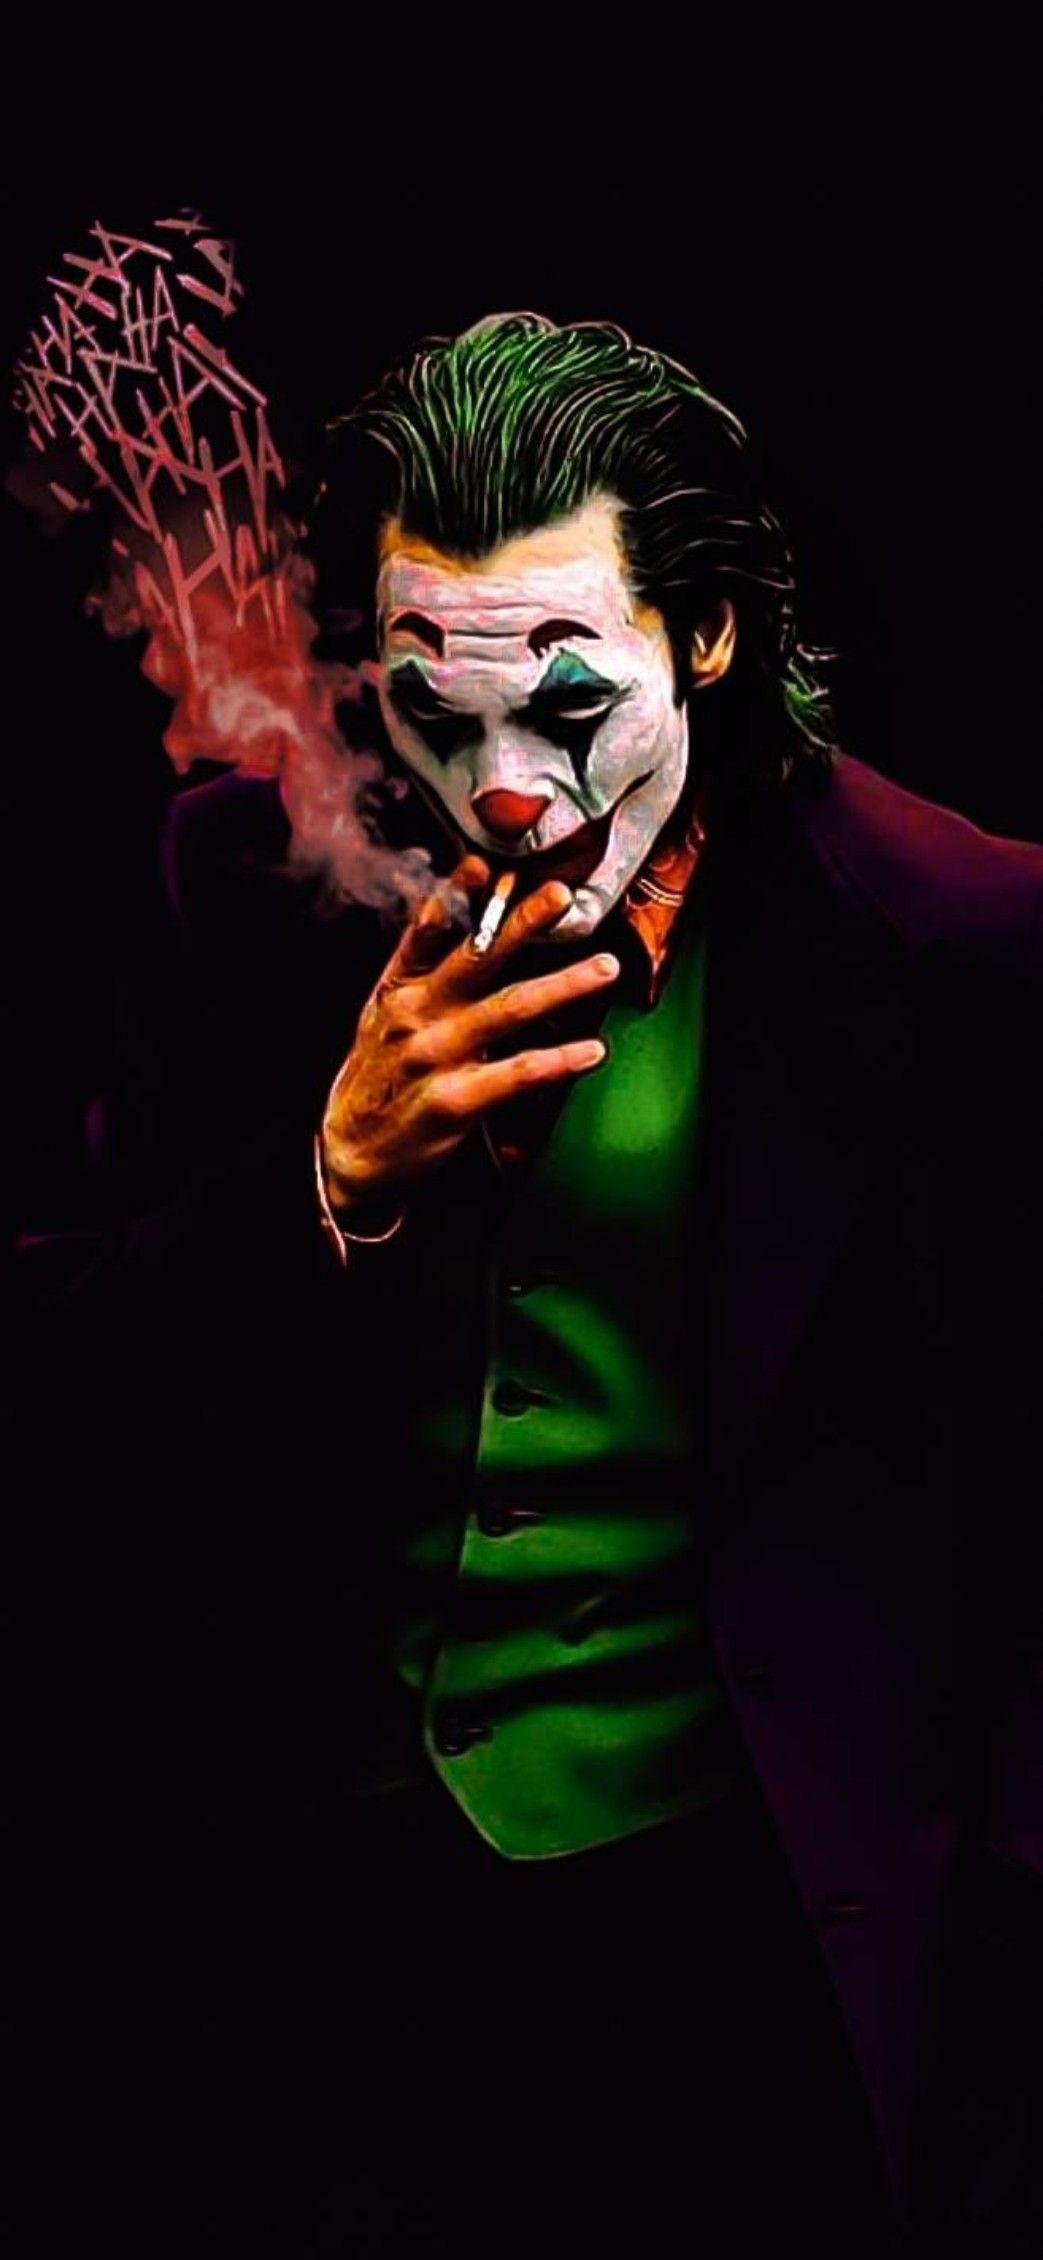 Pin By Nemiska On Manzara In 2020 Joker Wallpapers Joker Pics